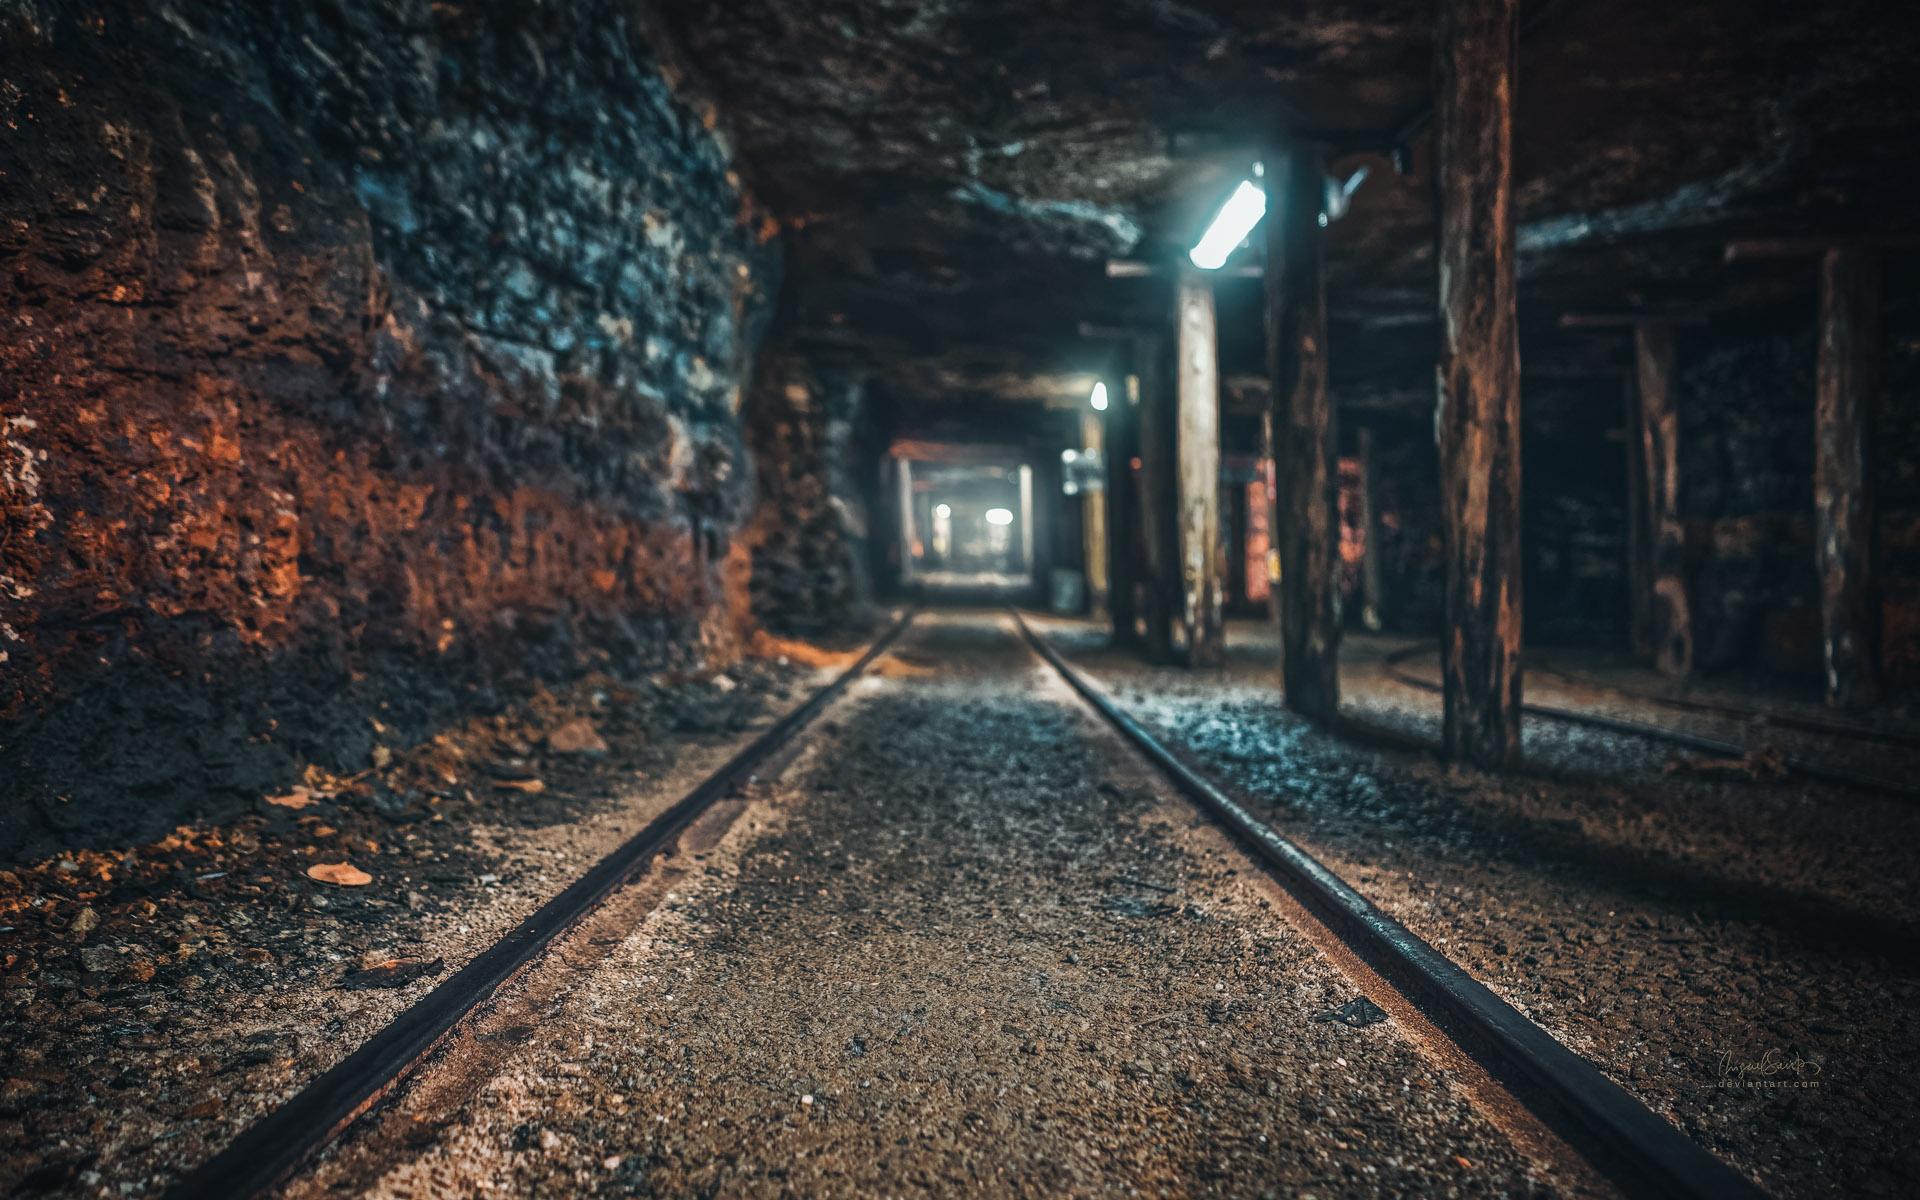 Coal mine by miguel santos free desktop wallpaper - Mining images hd ...